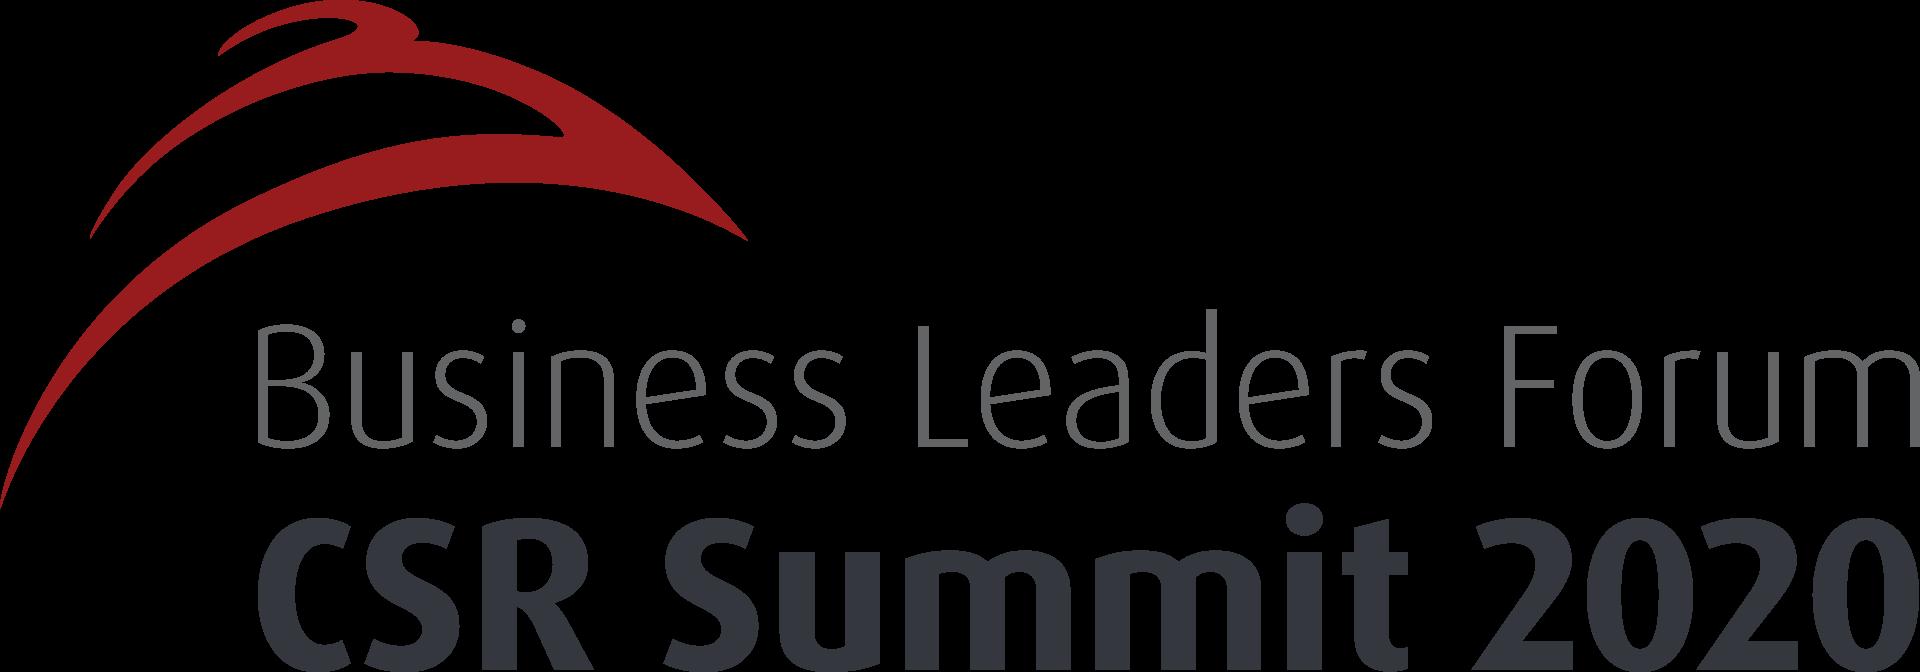 BLF CSR Summit logo